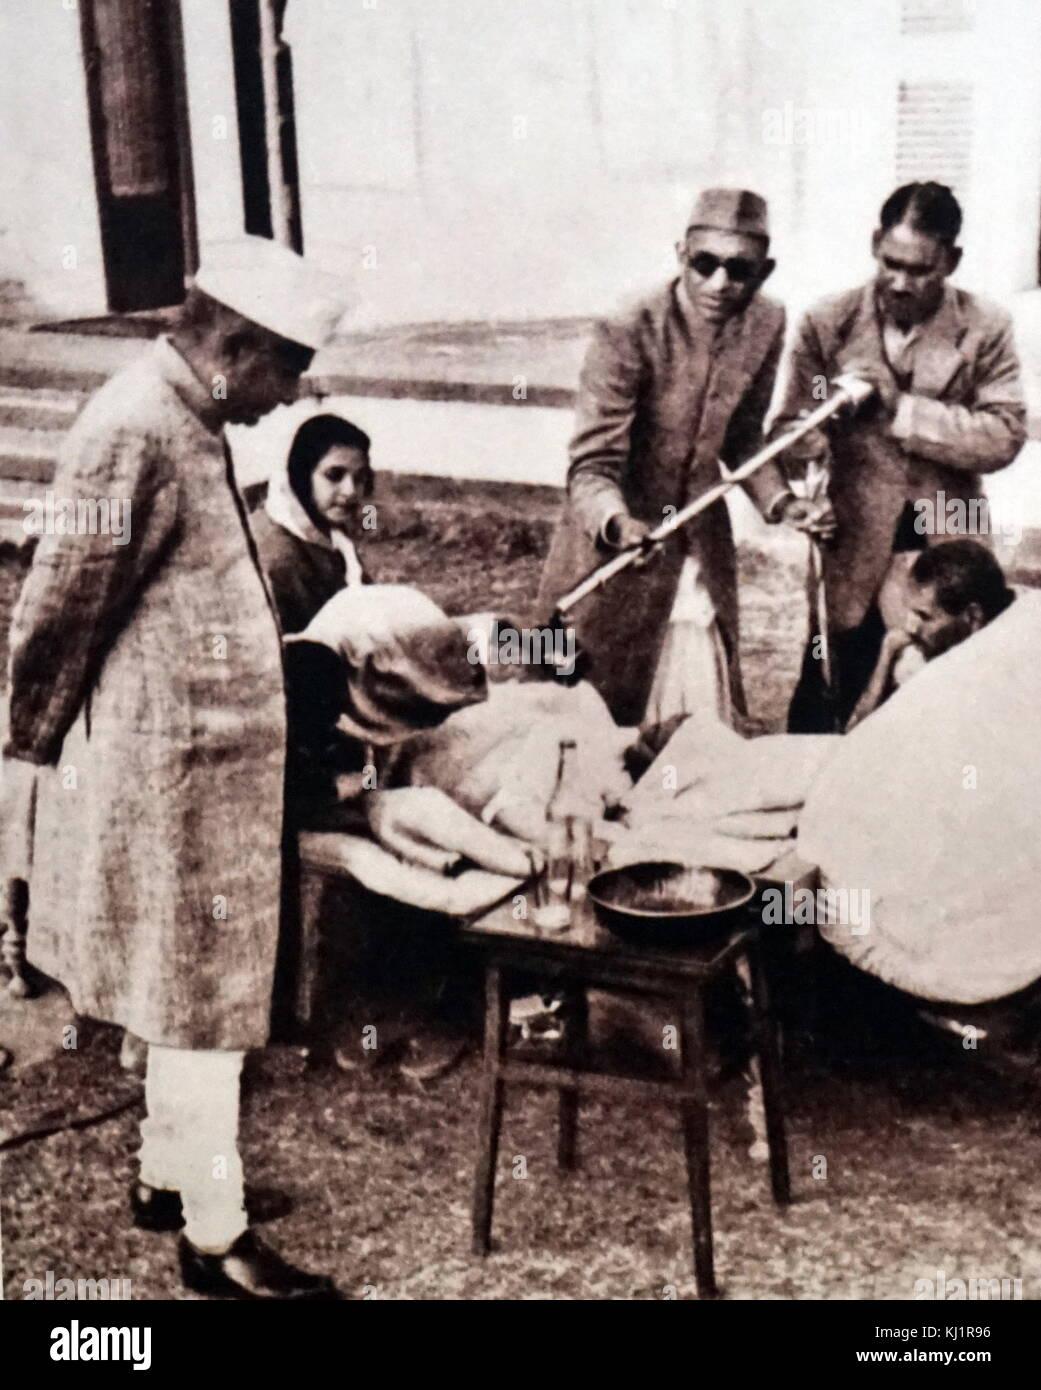 biography of mahatma gandhi the preeminent leader of indian independence movement in british ruled i Mohandas karamchand gandhi ( 2 october 1869 – 30 january 1948) was the preeminent leader of indian independence movement in british.